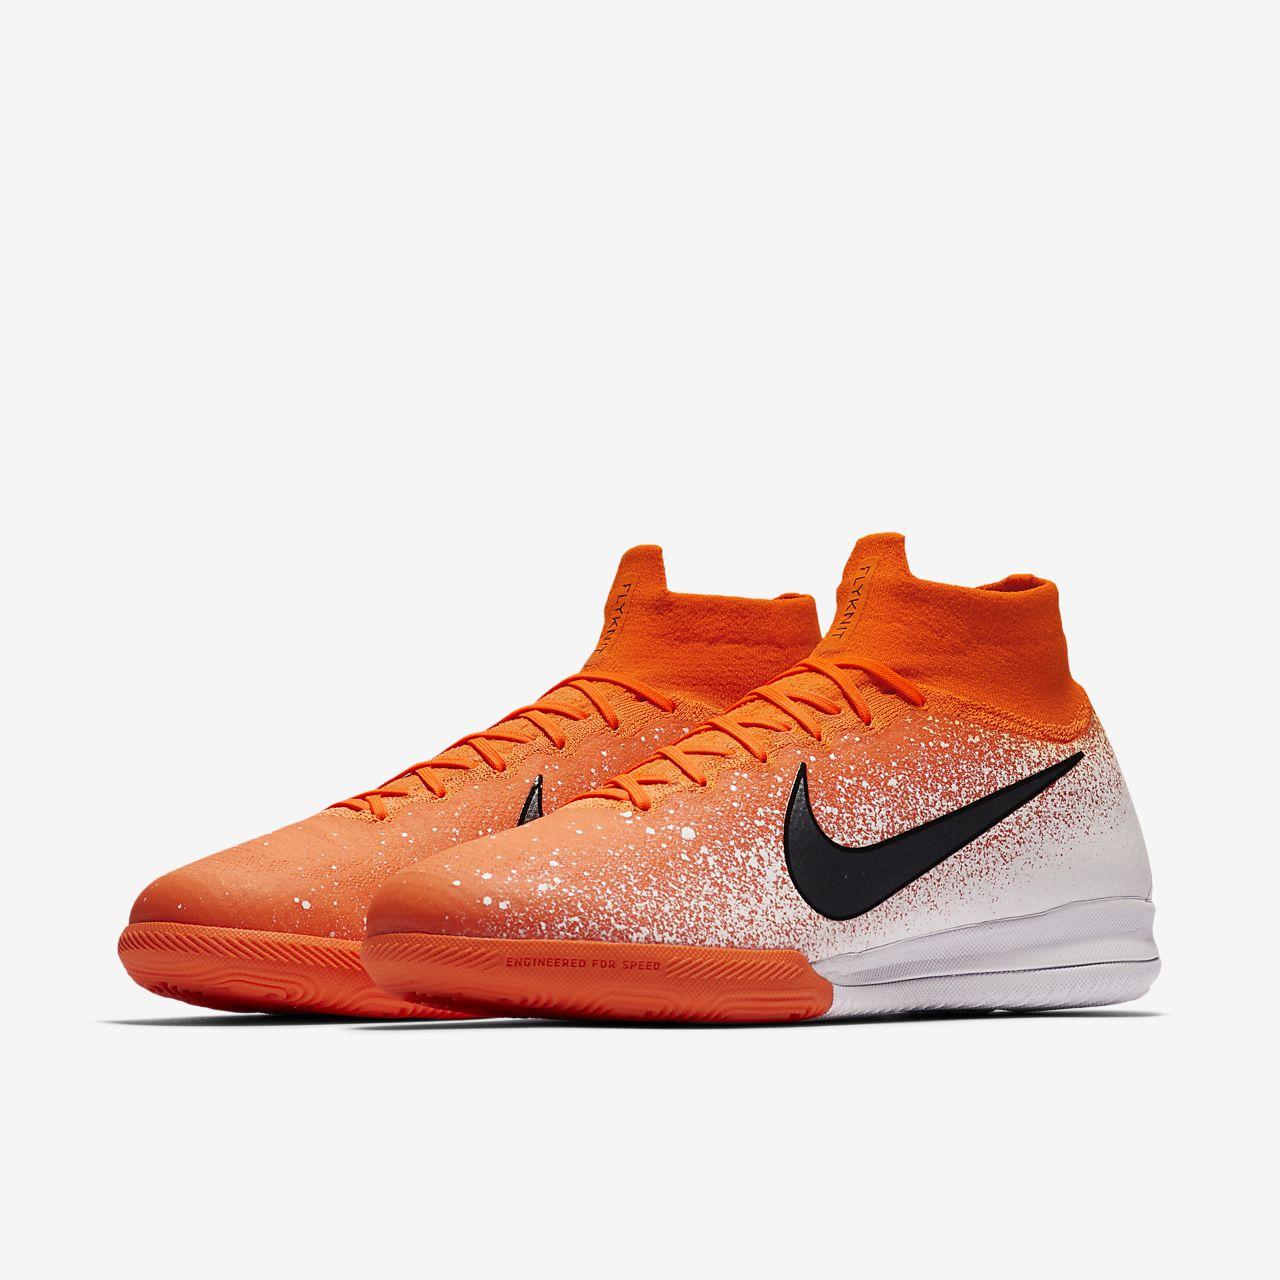 Football Elite En Salle Homme Ic Superflyx De À Nike 6 Pour Crampons Chaussure w80kXNPnO